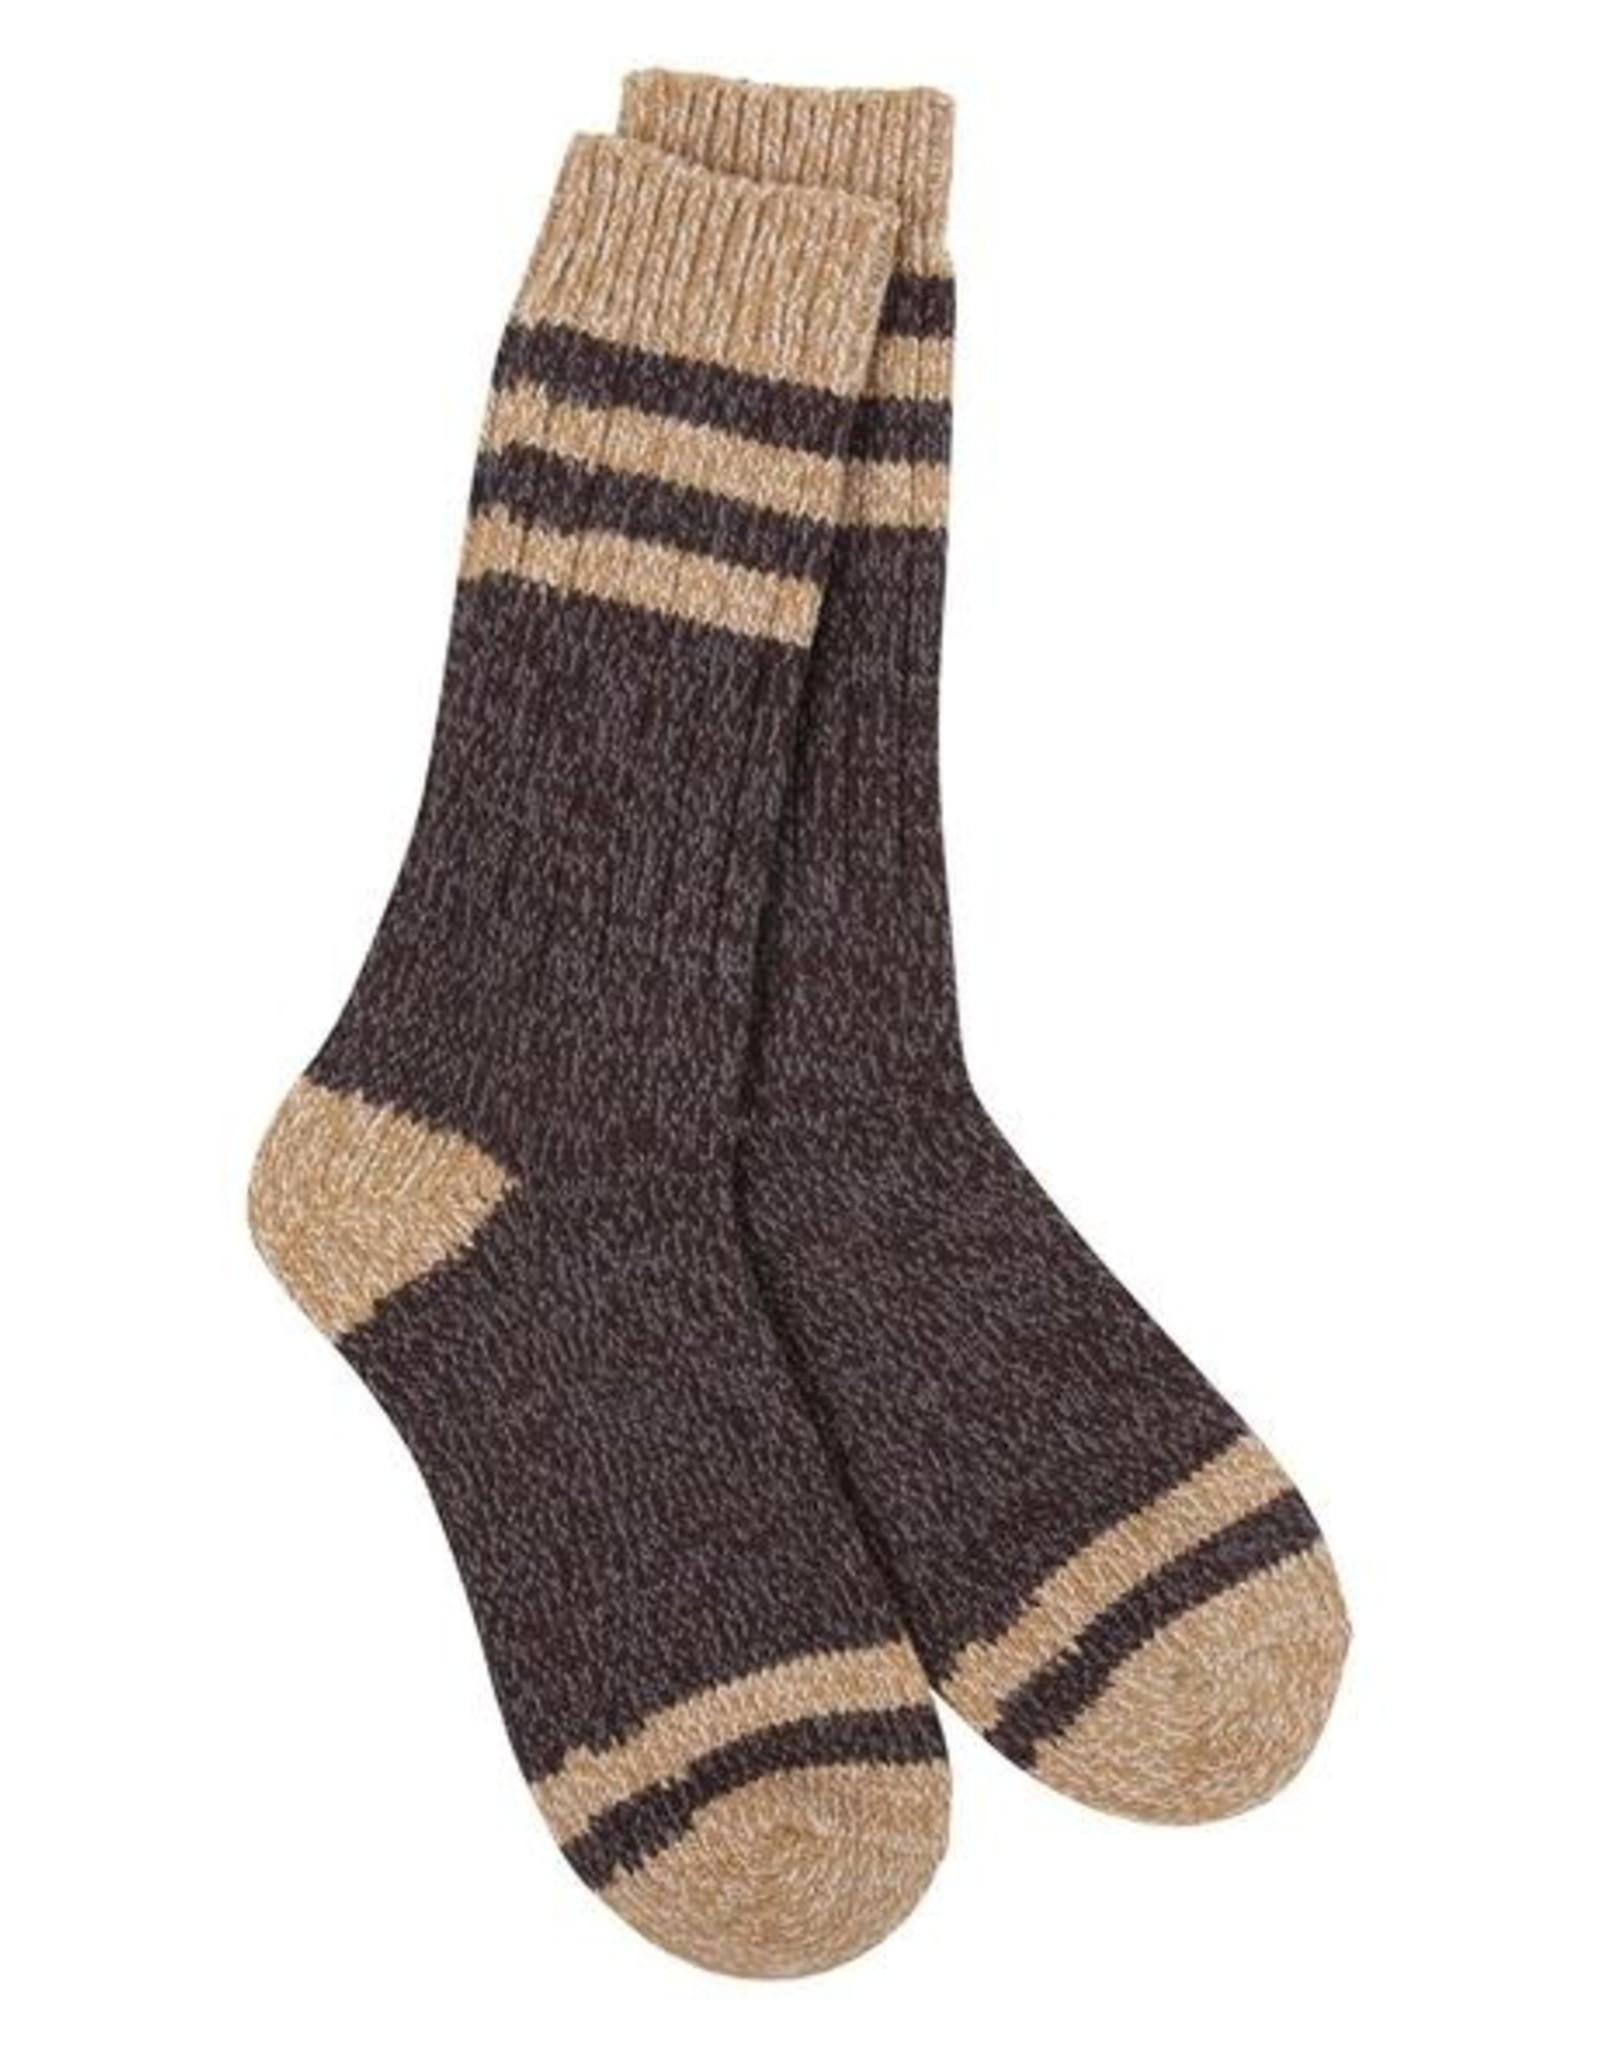 Crescent Sock Company Weekend Socks Black Coffee